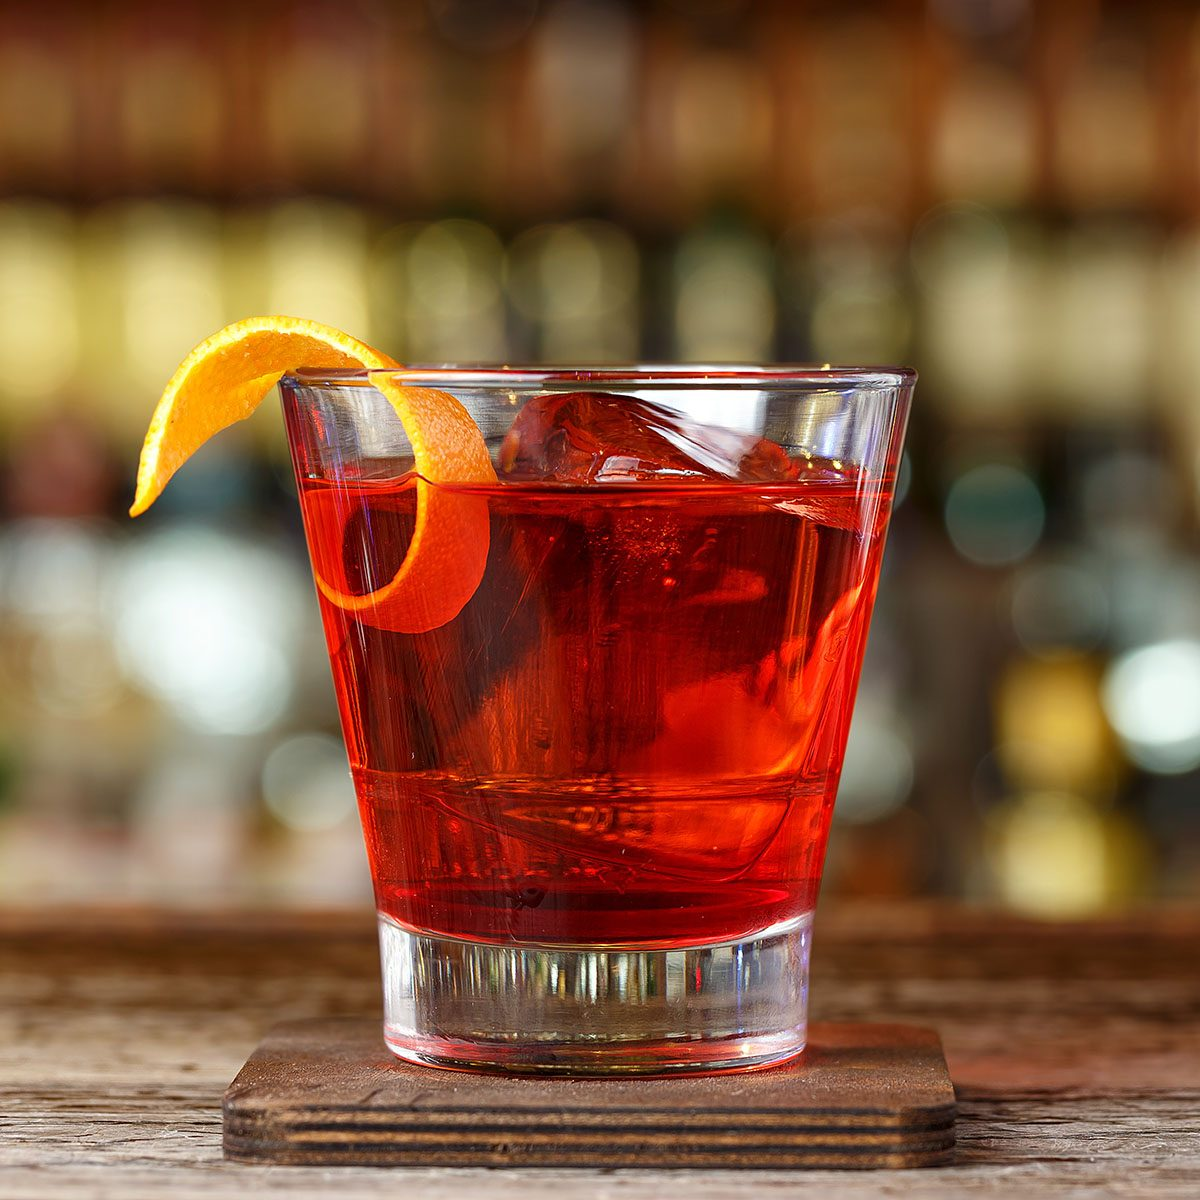 Classic cocktail Negroni with gin, campari and martini rosso